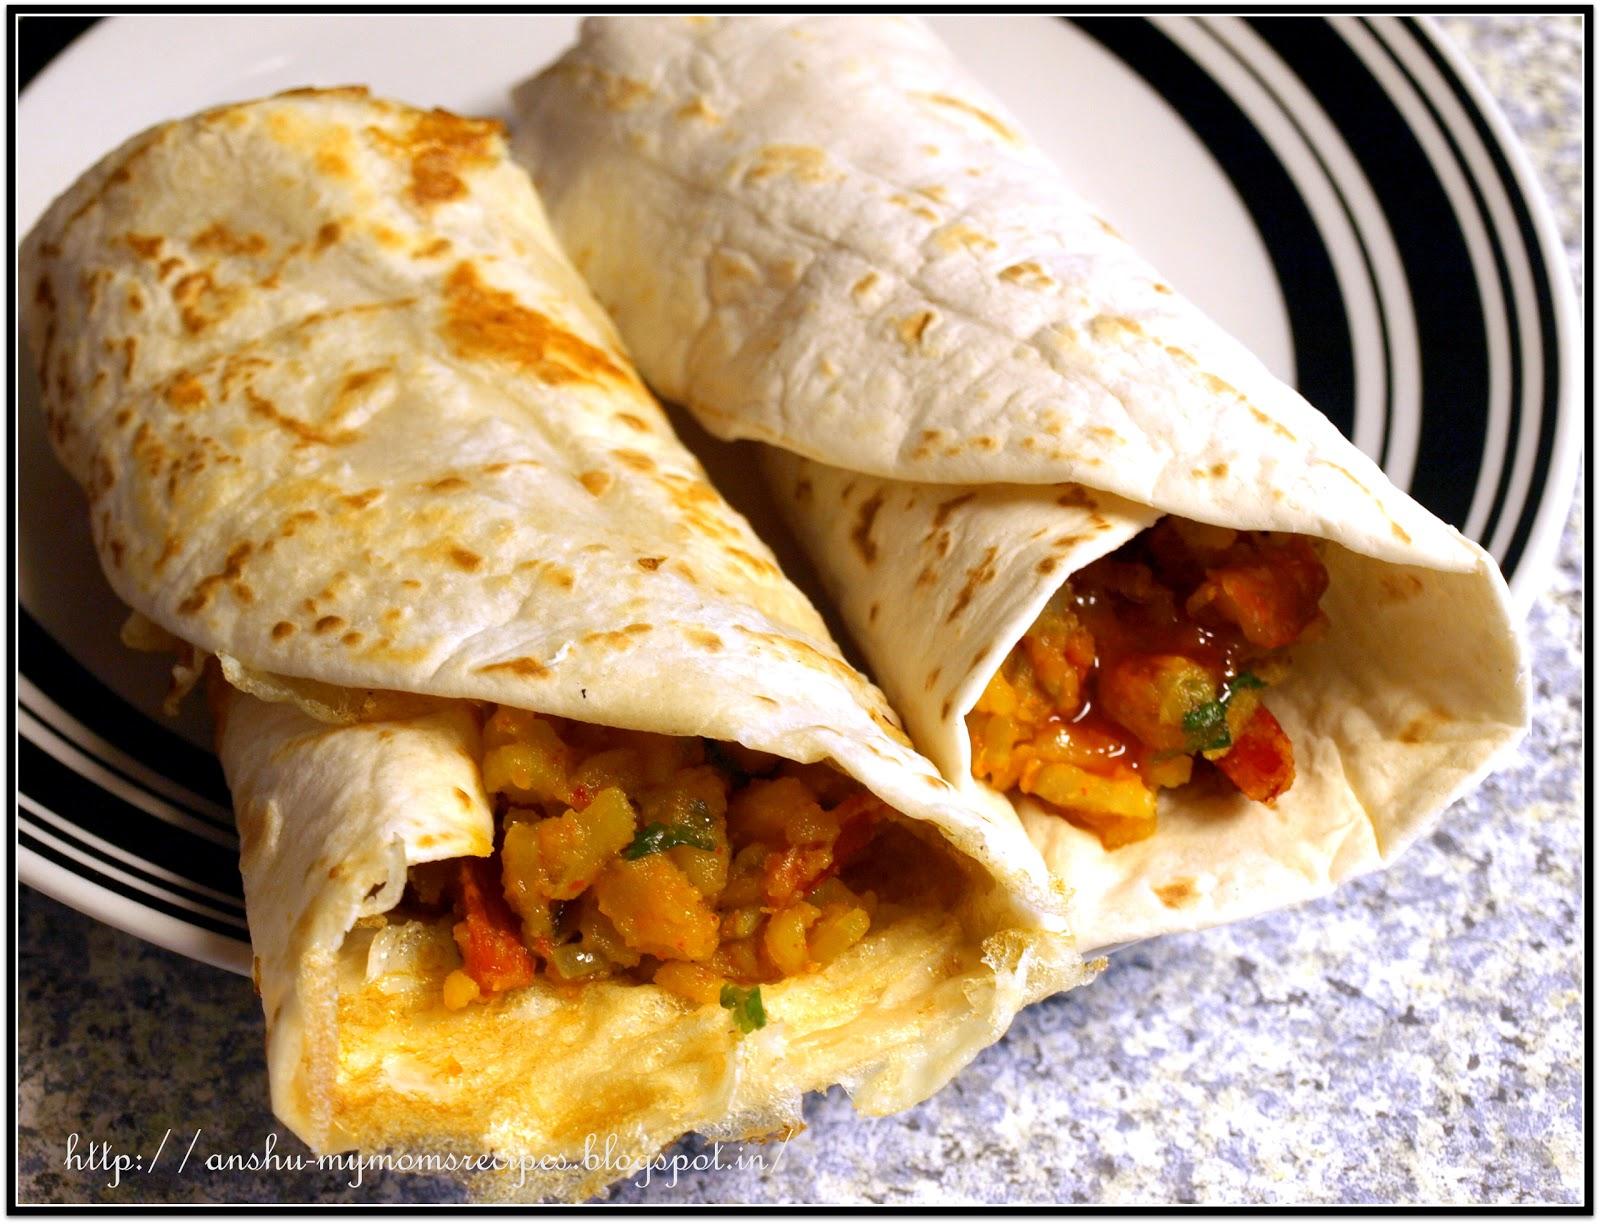 MY MOM'S RECIPES: Veggie Breakfast Burritos